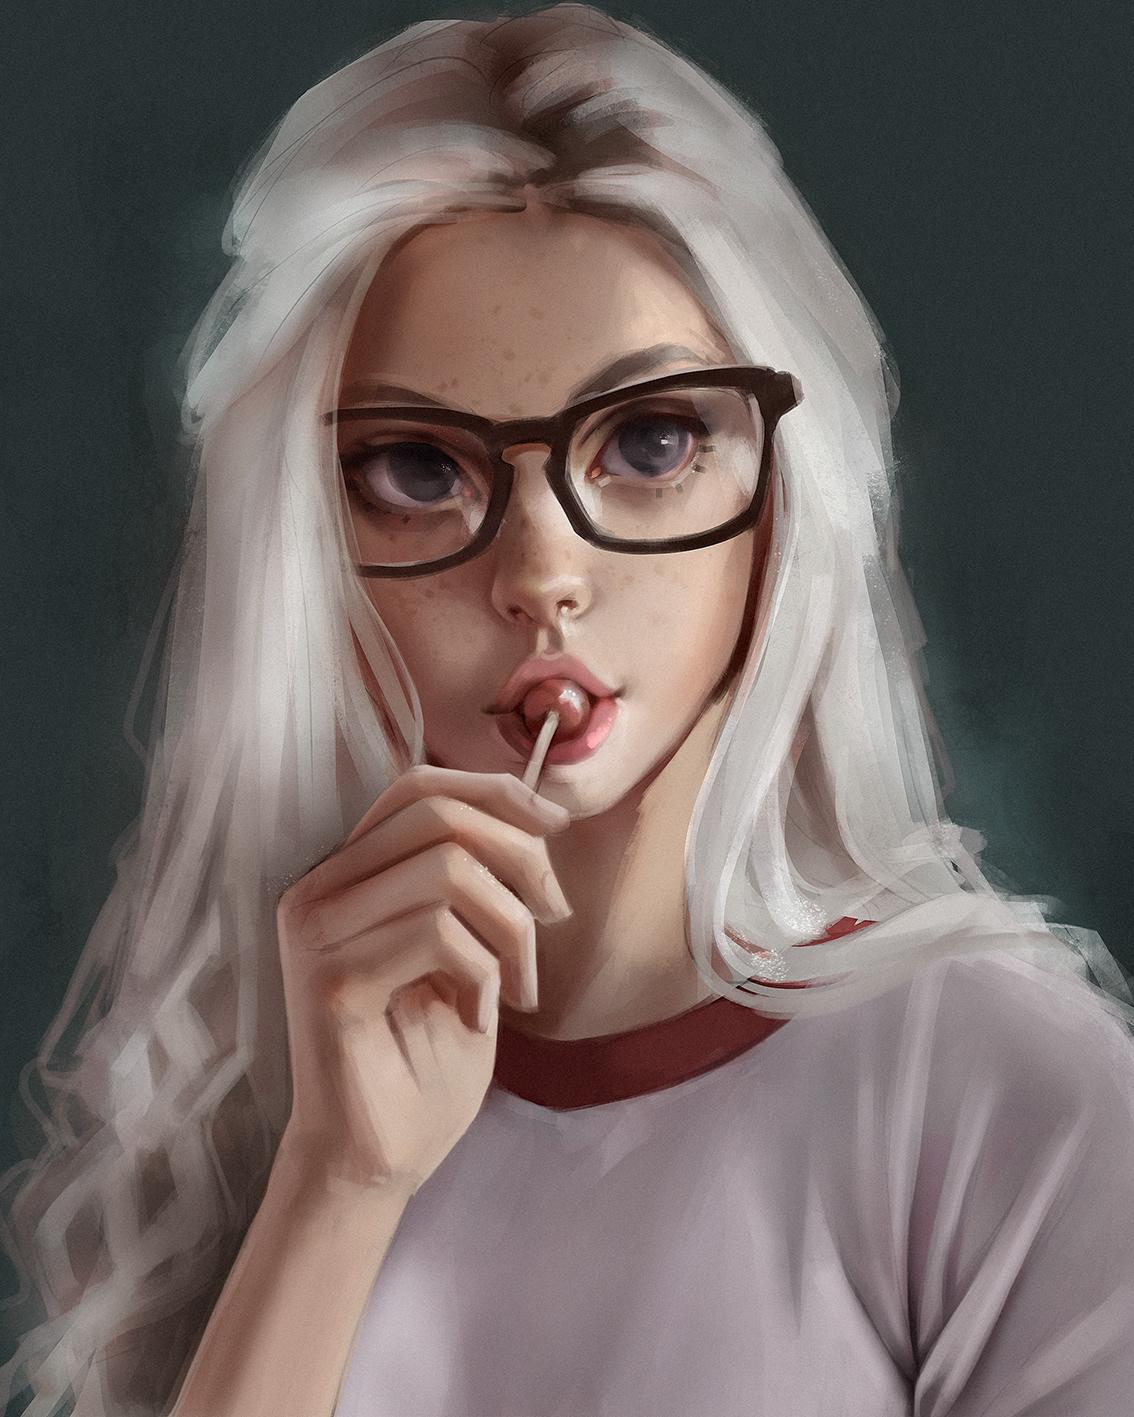 Digital Art,Character Design,Drawing